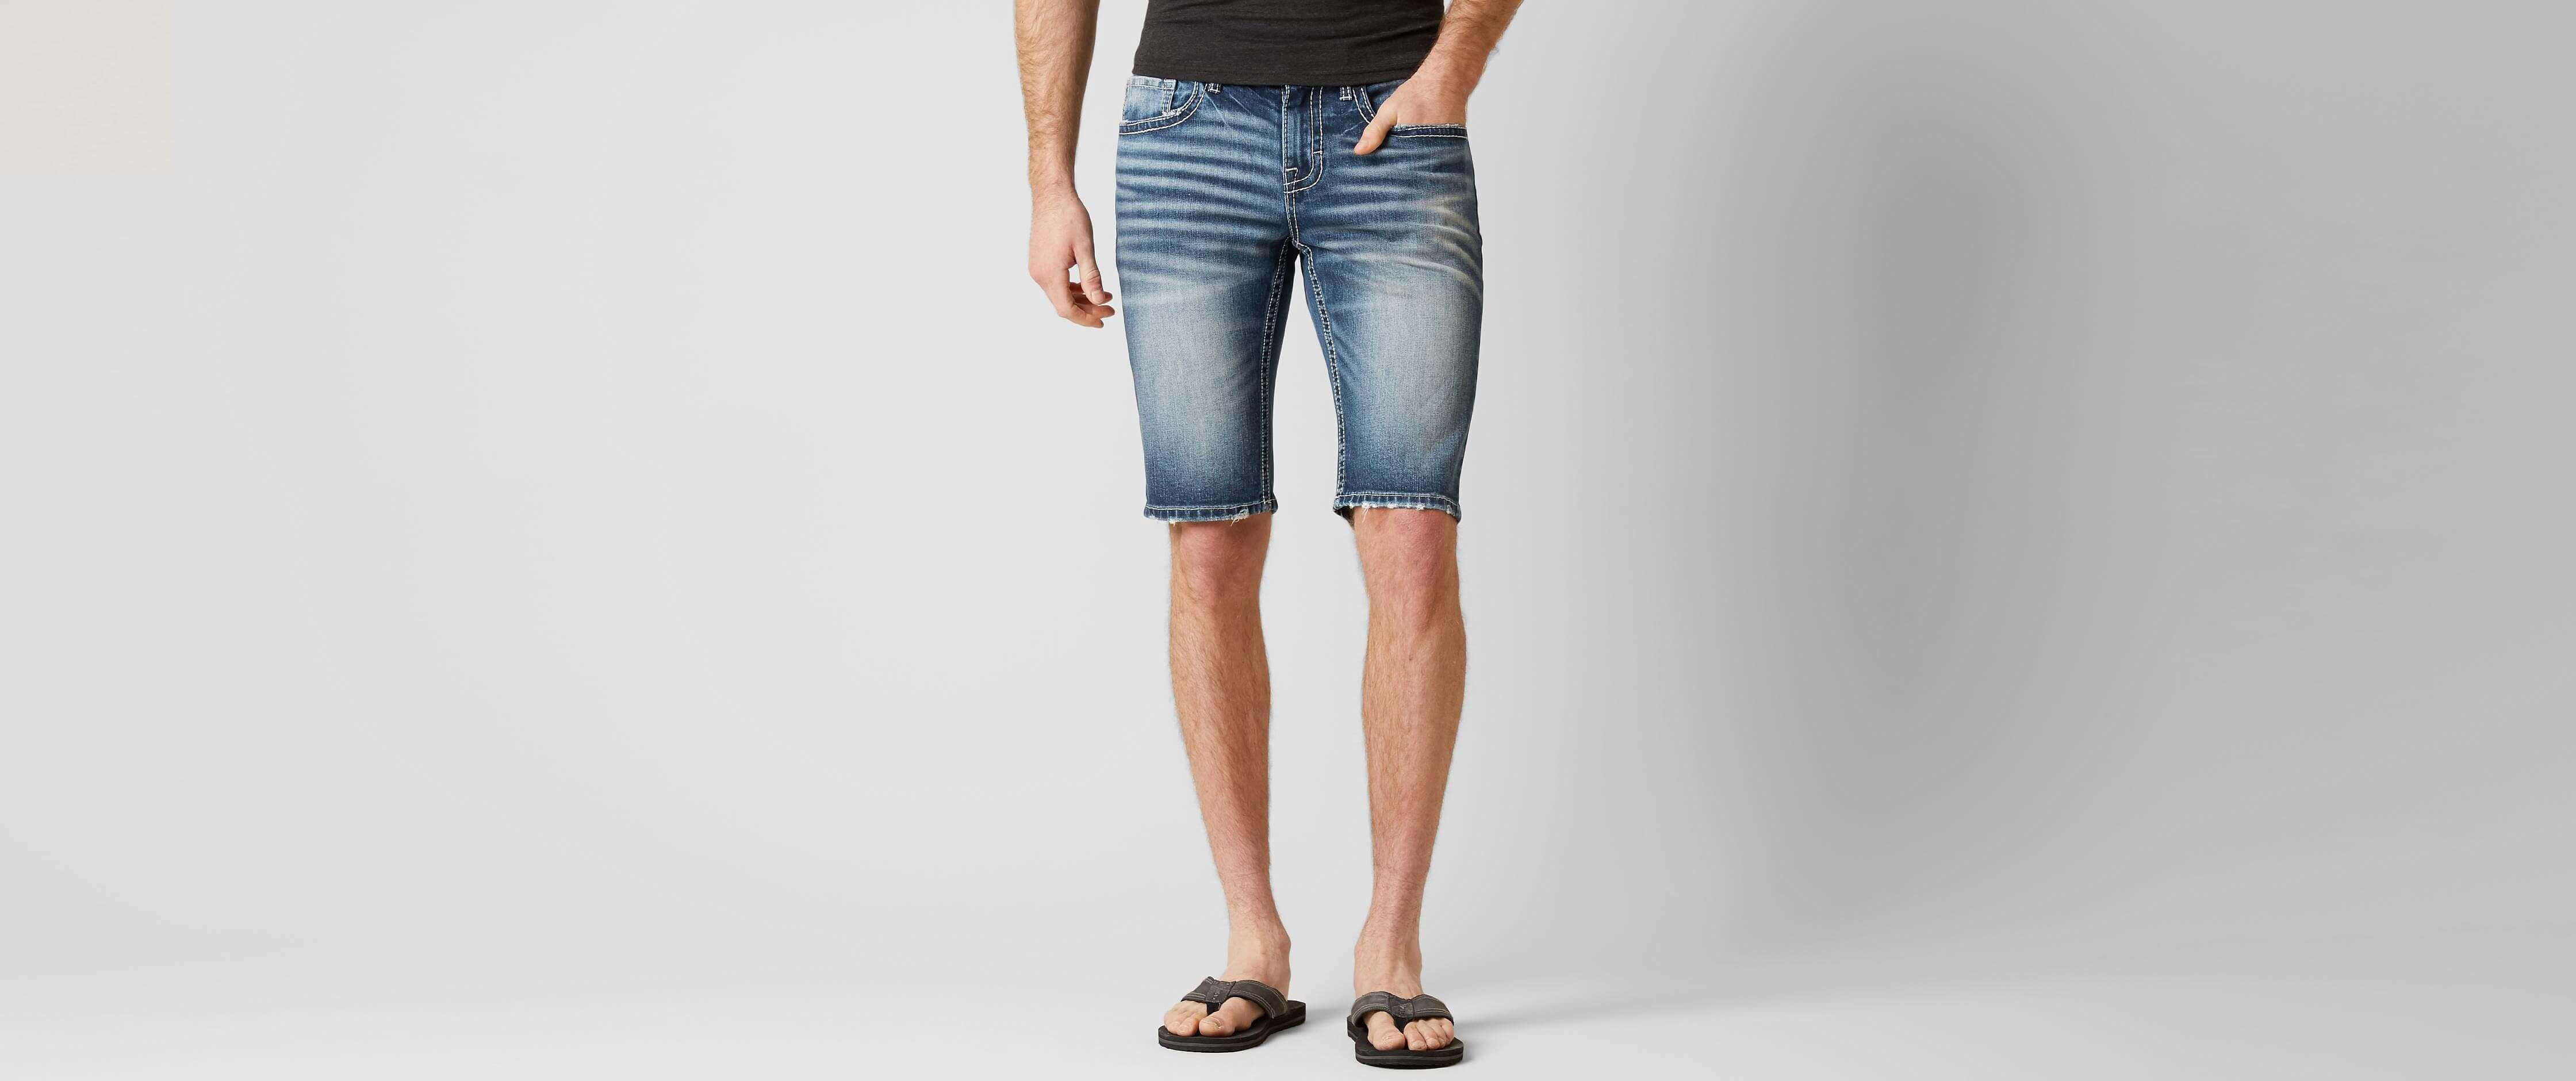 Shorts For Men Jeans